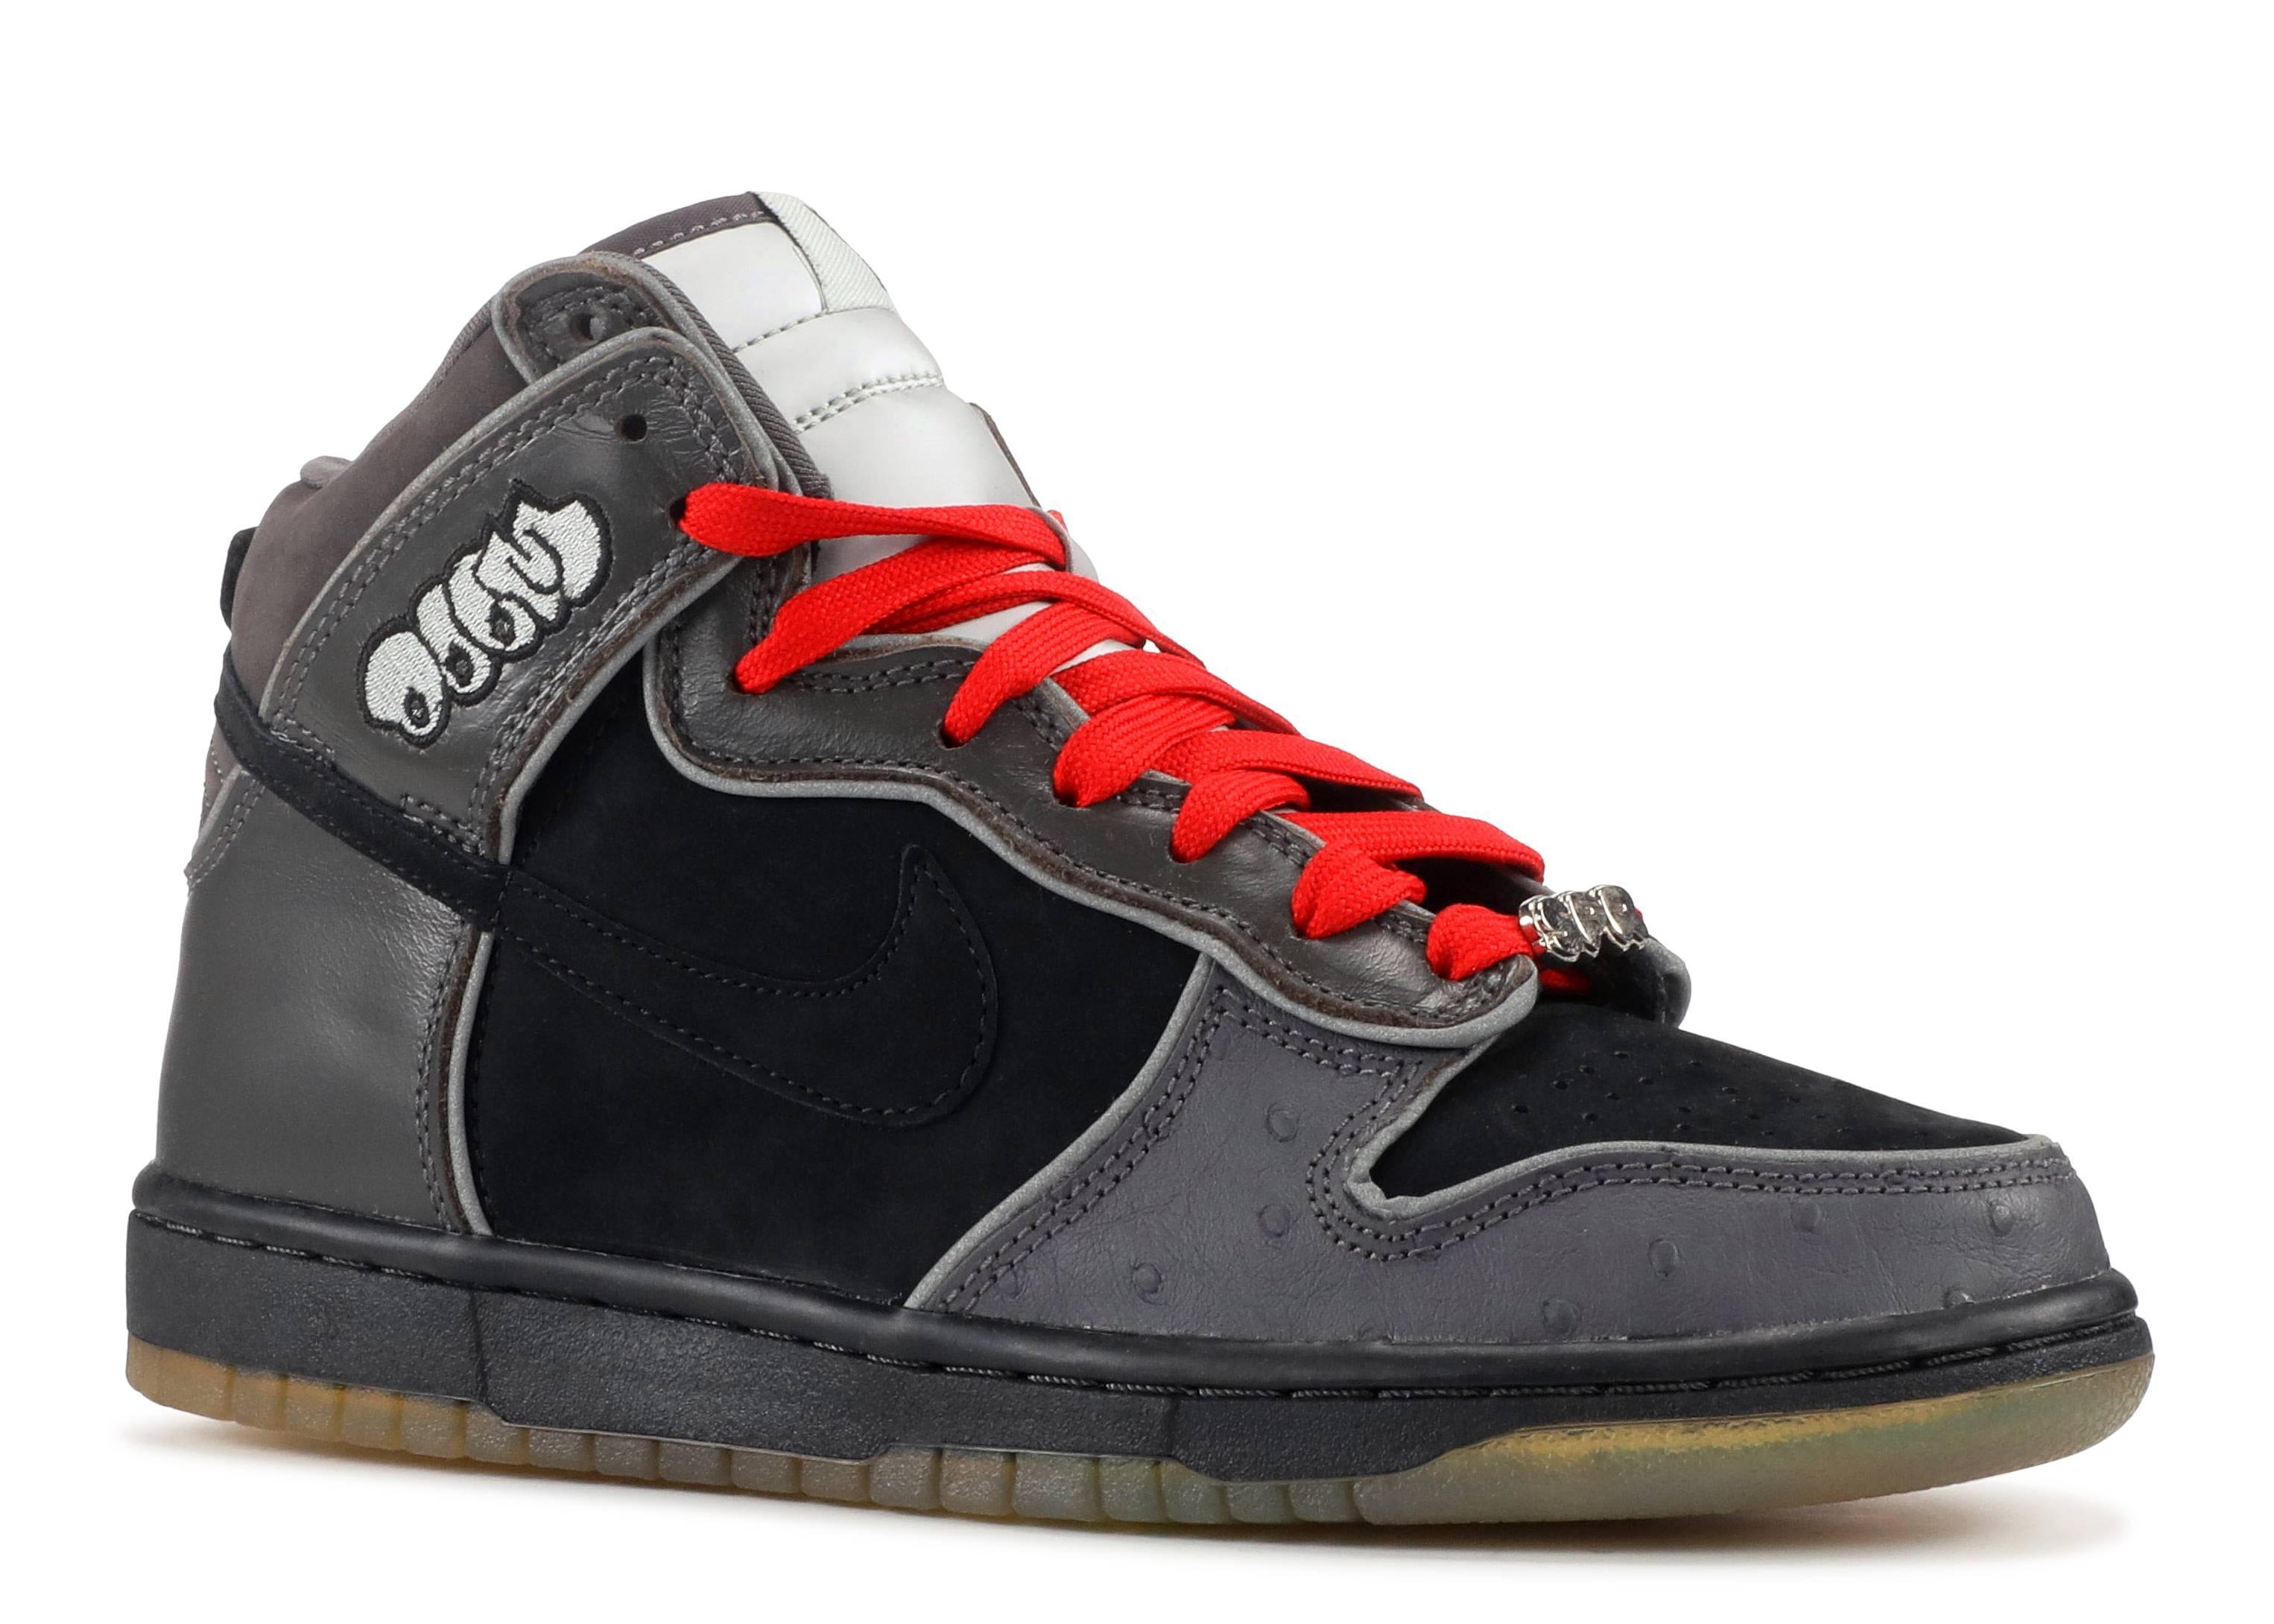 Nike Dunk High Sb Premium 'mf Doom' for